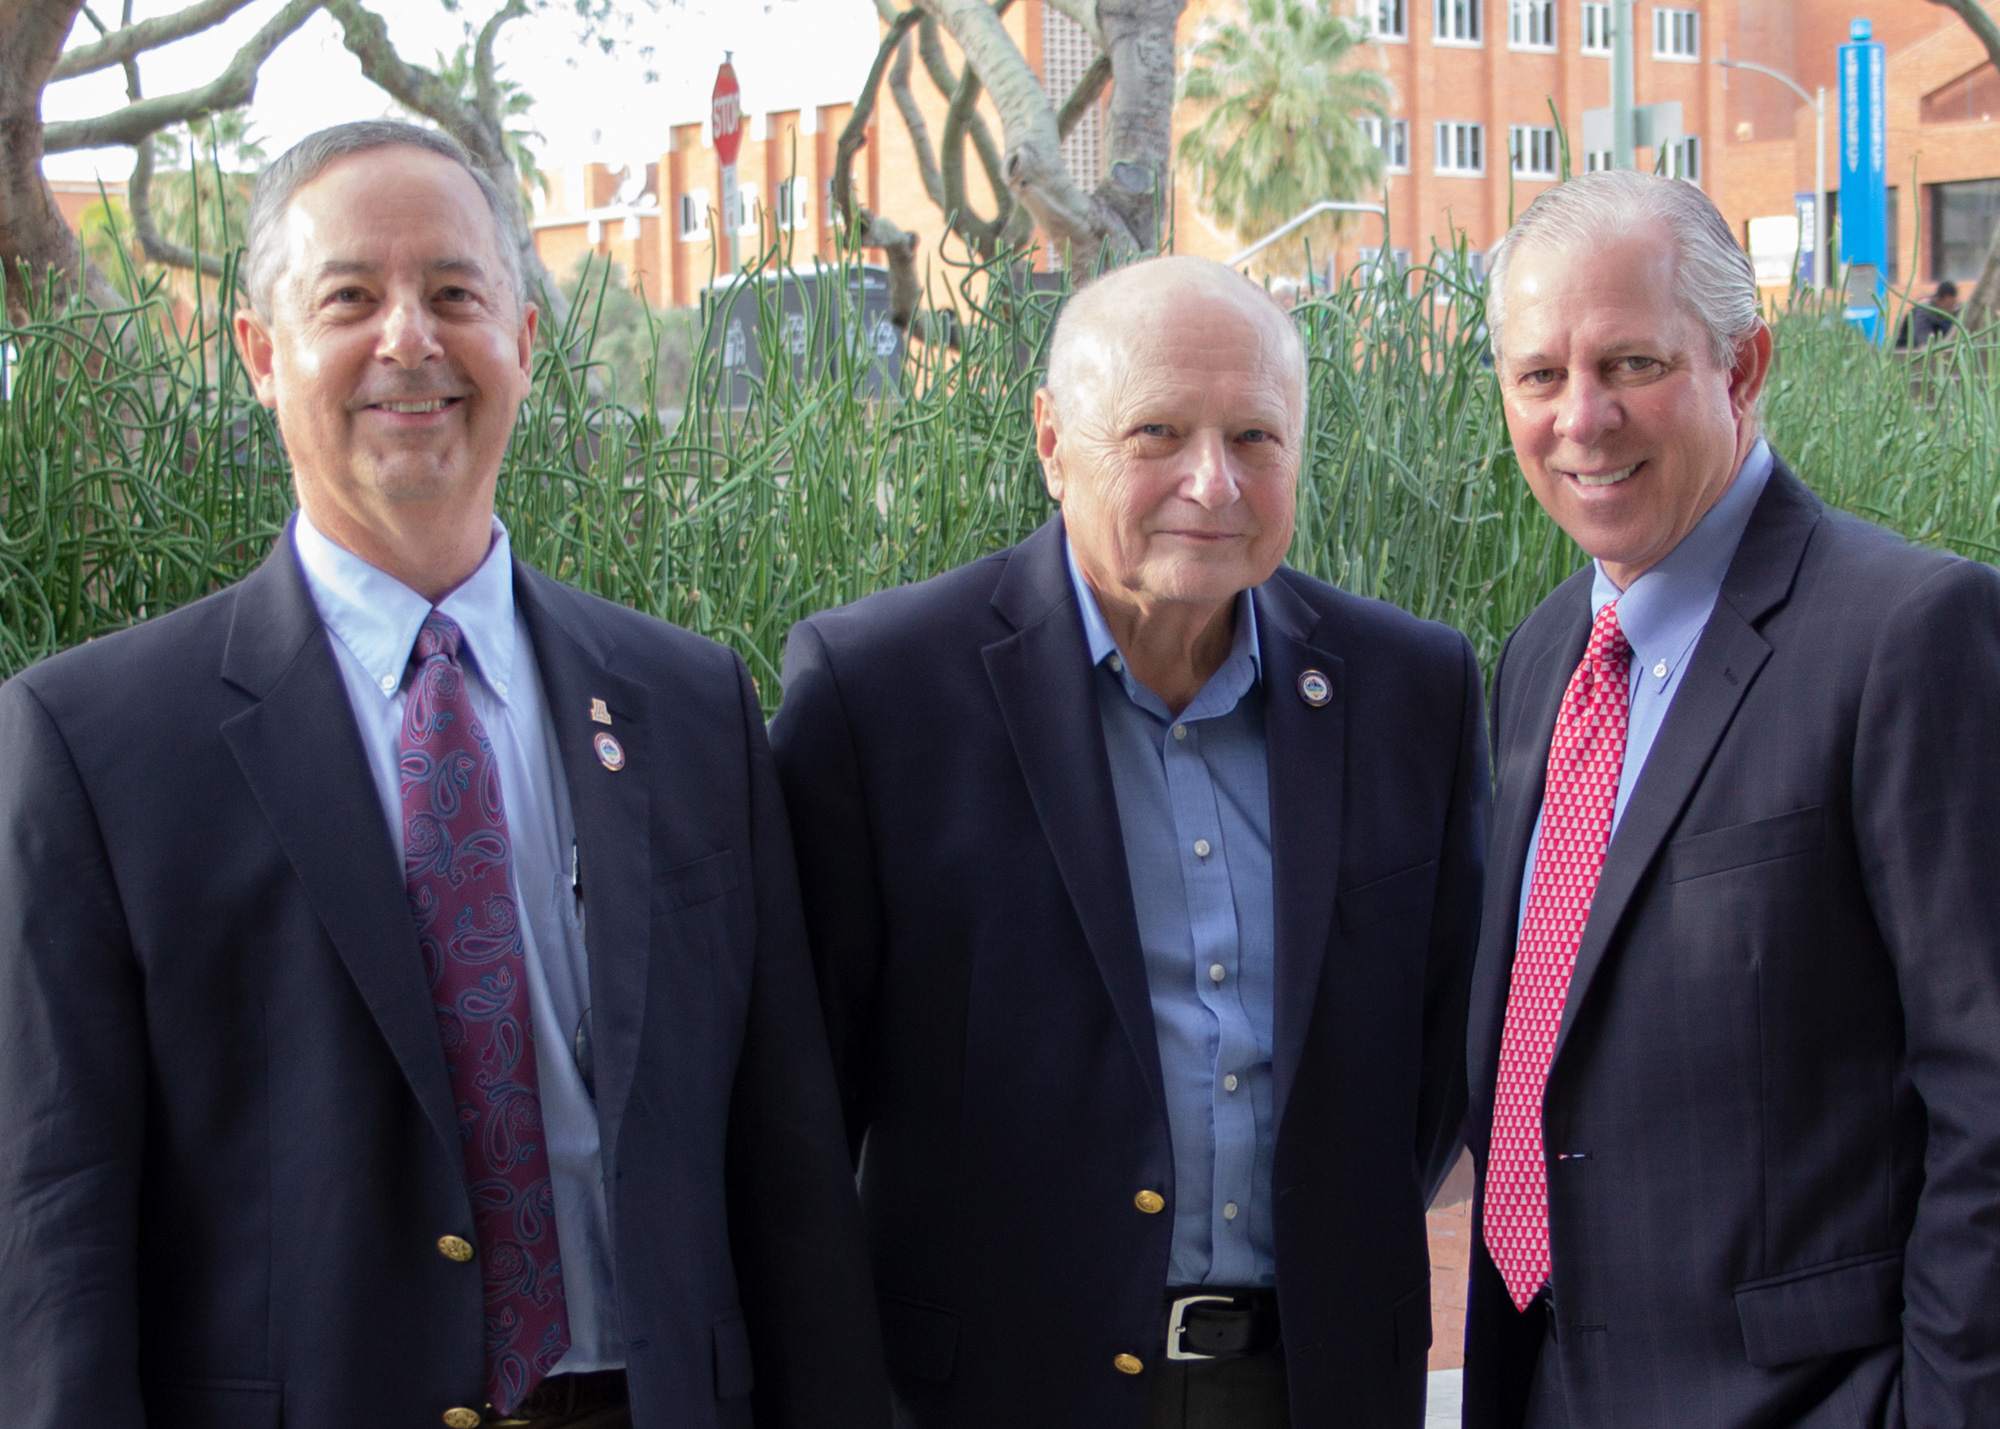 Left to right: UA College of Optical Sciences Dean Thomas Koch, Professor Emeritus James Wyant and UA President Robert C. Robbins